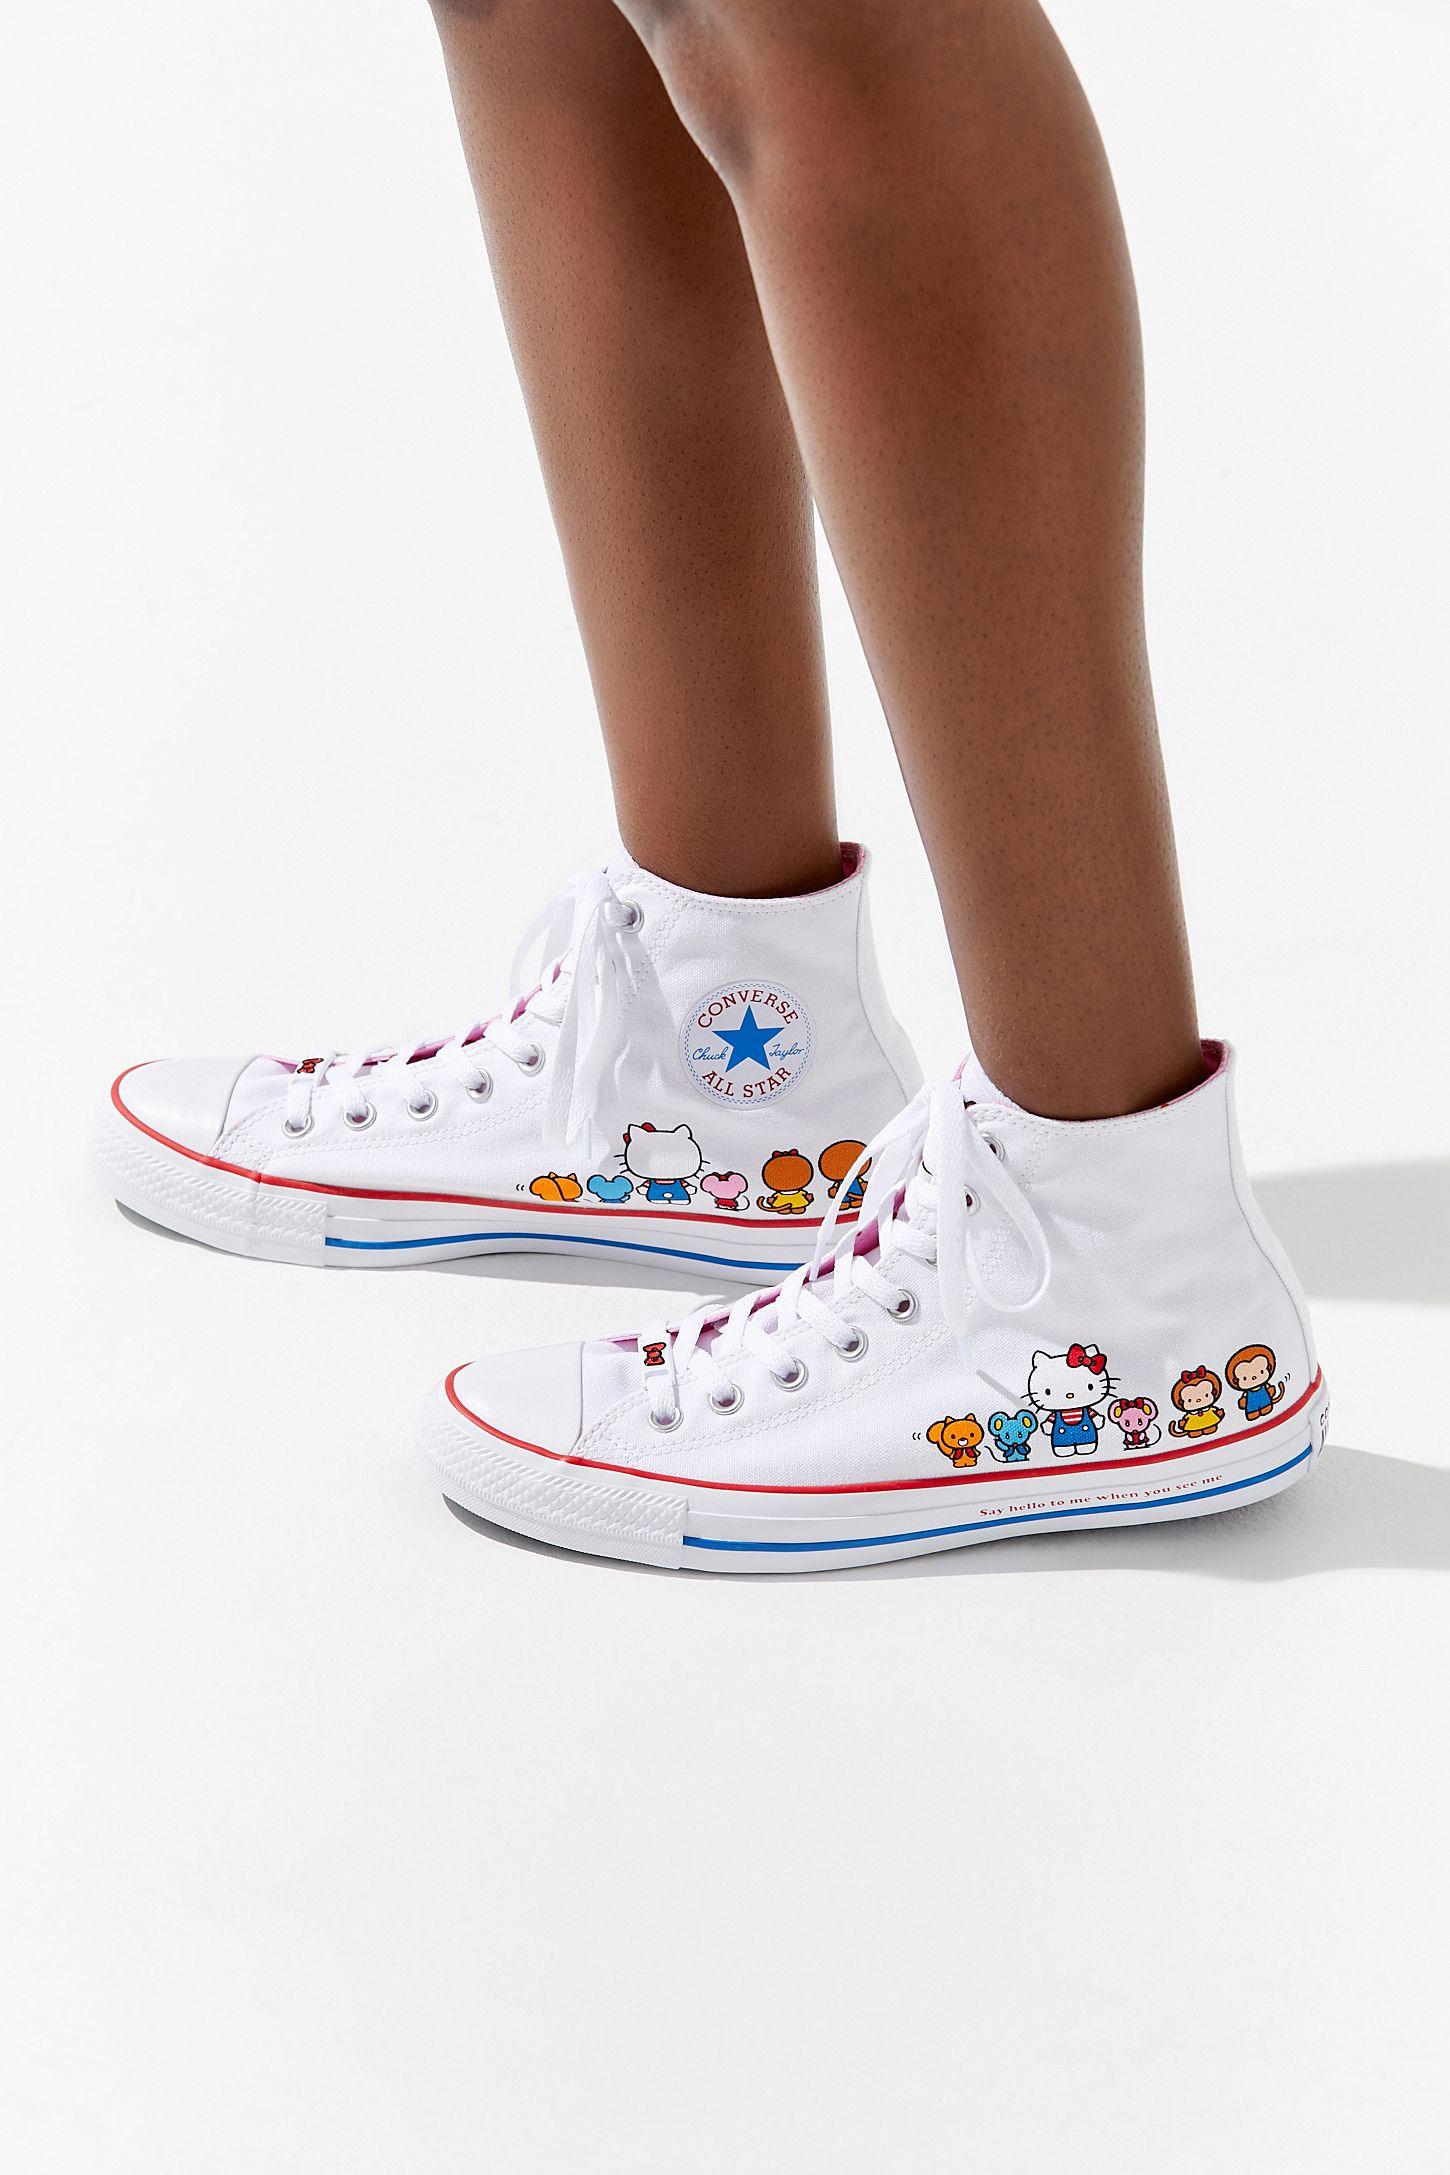 3b4eeb9544b6 Converse X Hello Kitty Chuck Taylor All Star High Top Sneaker ...